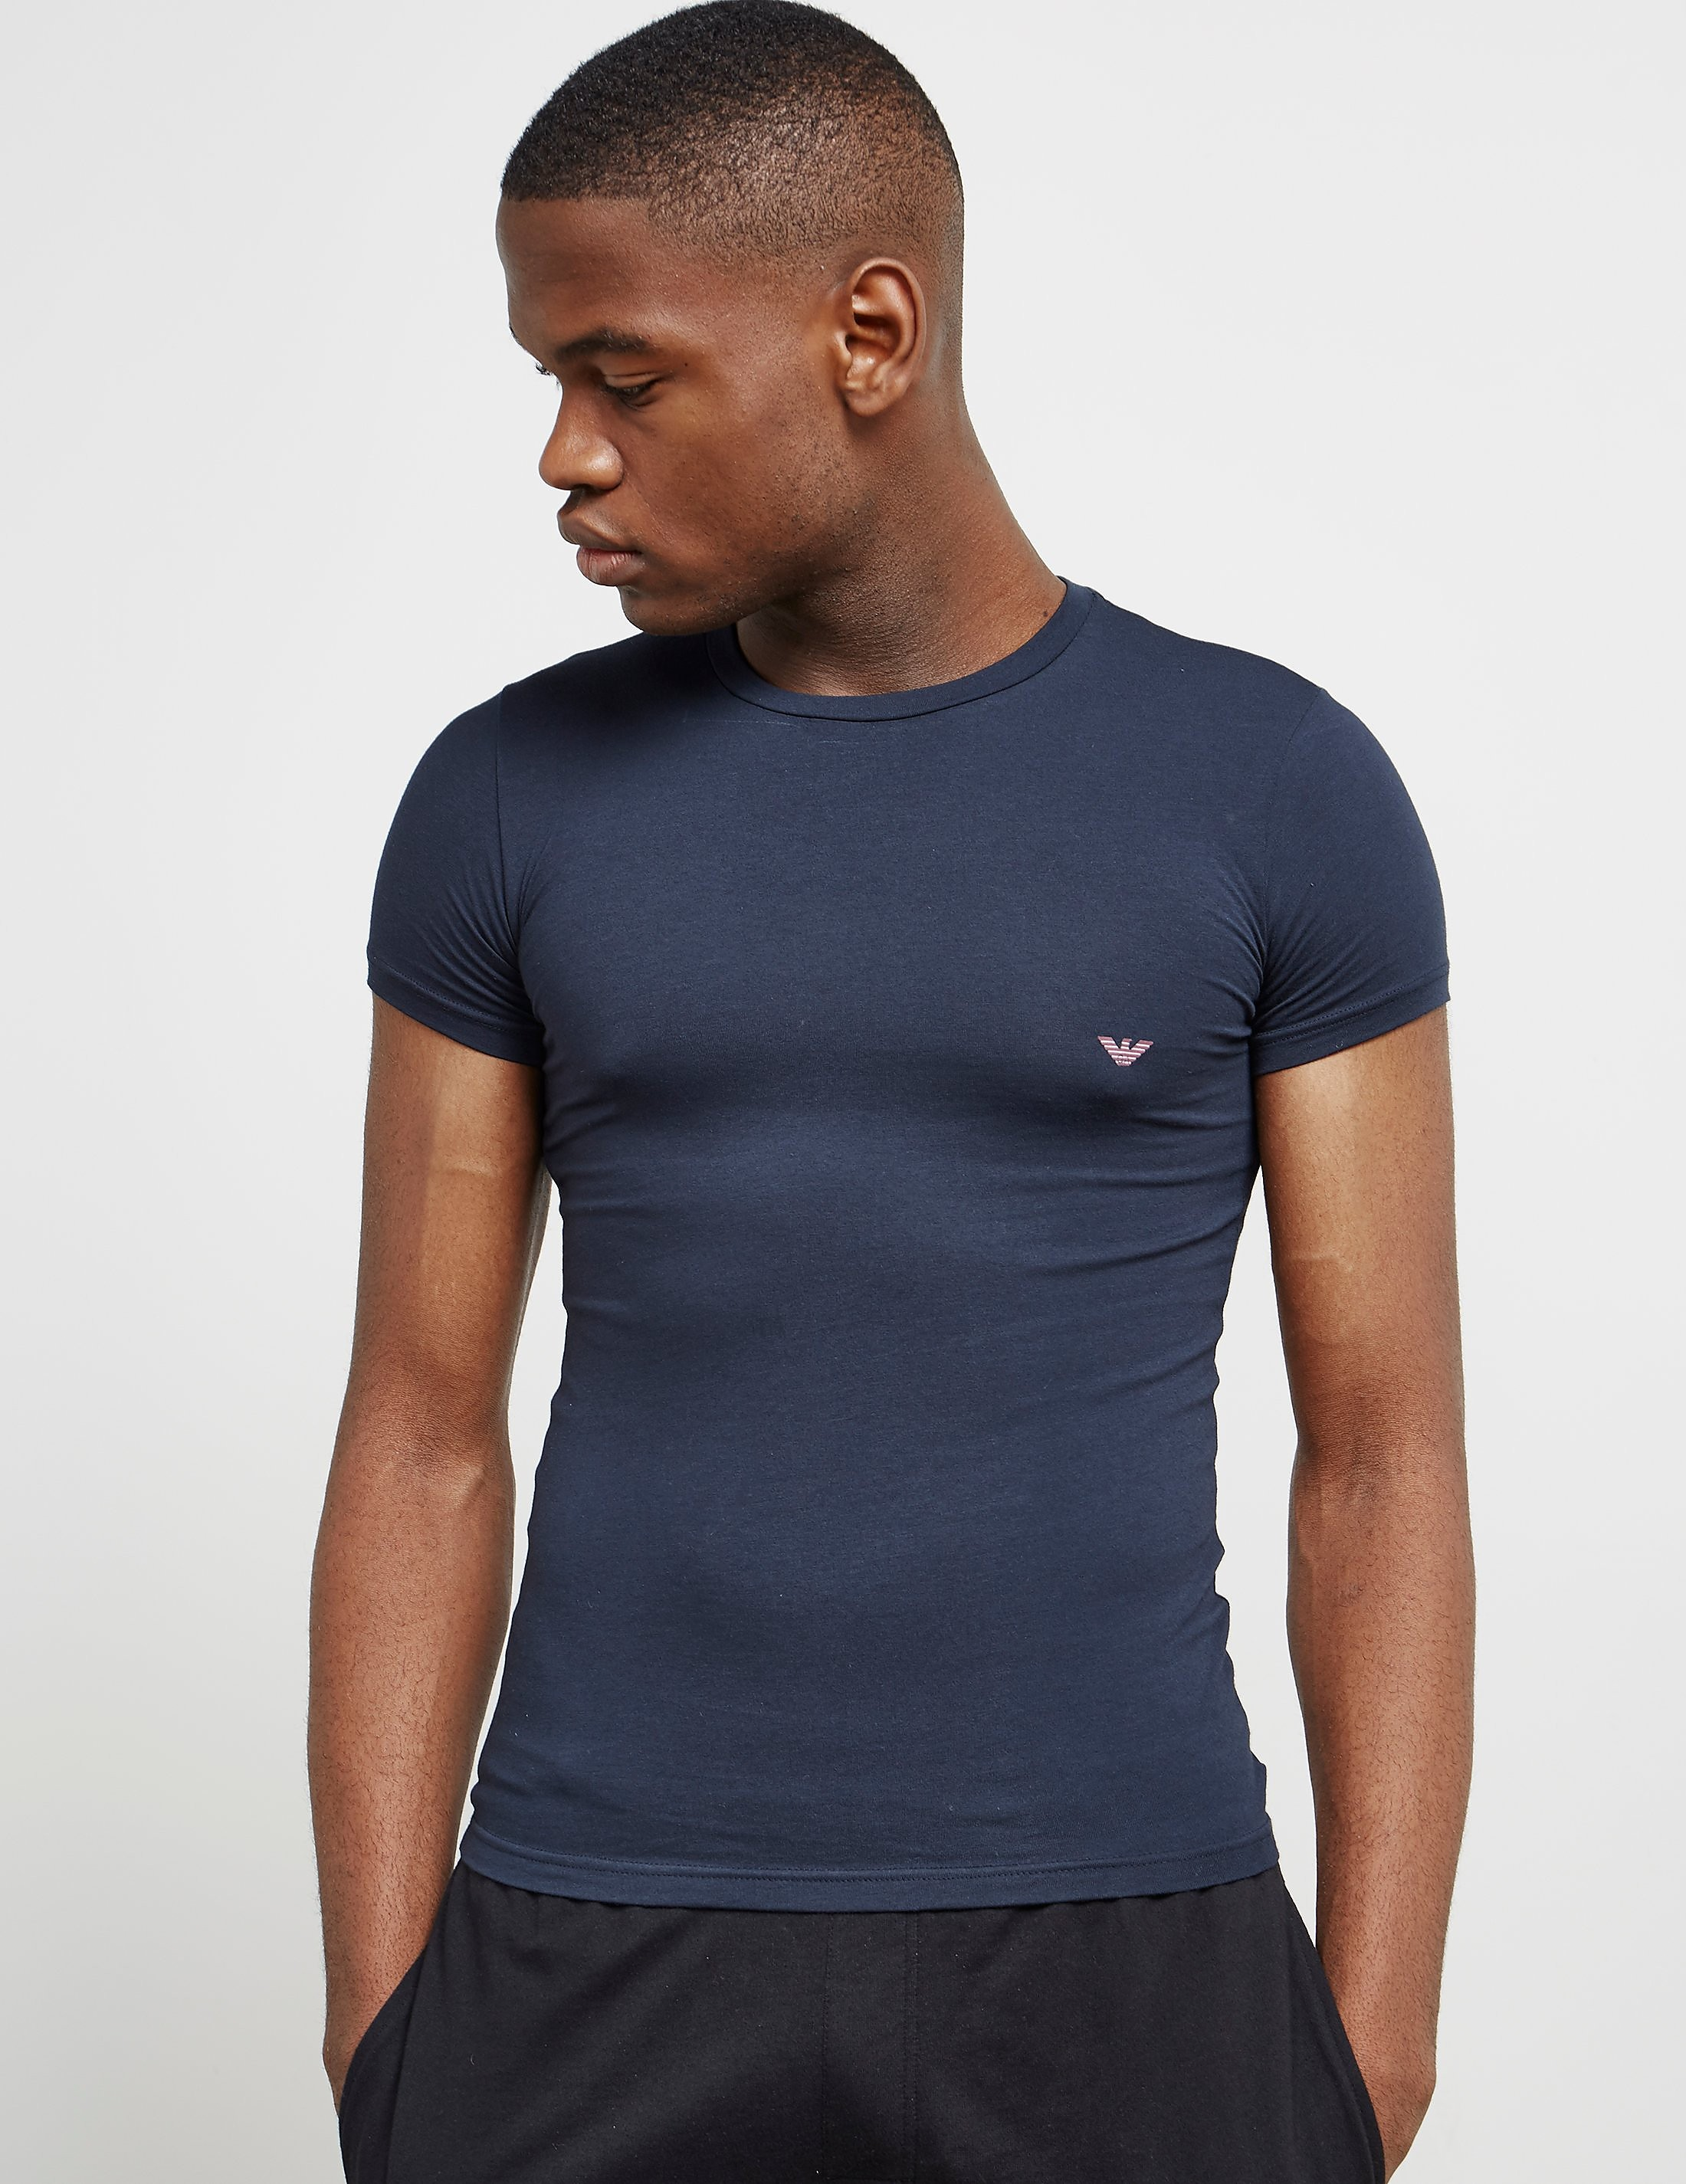 Emporio Armani Small Eagle Short Sleeve T-Shirt